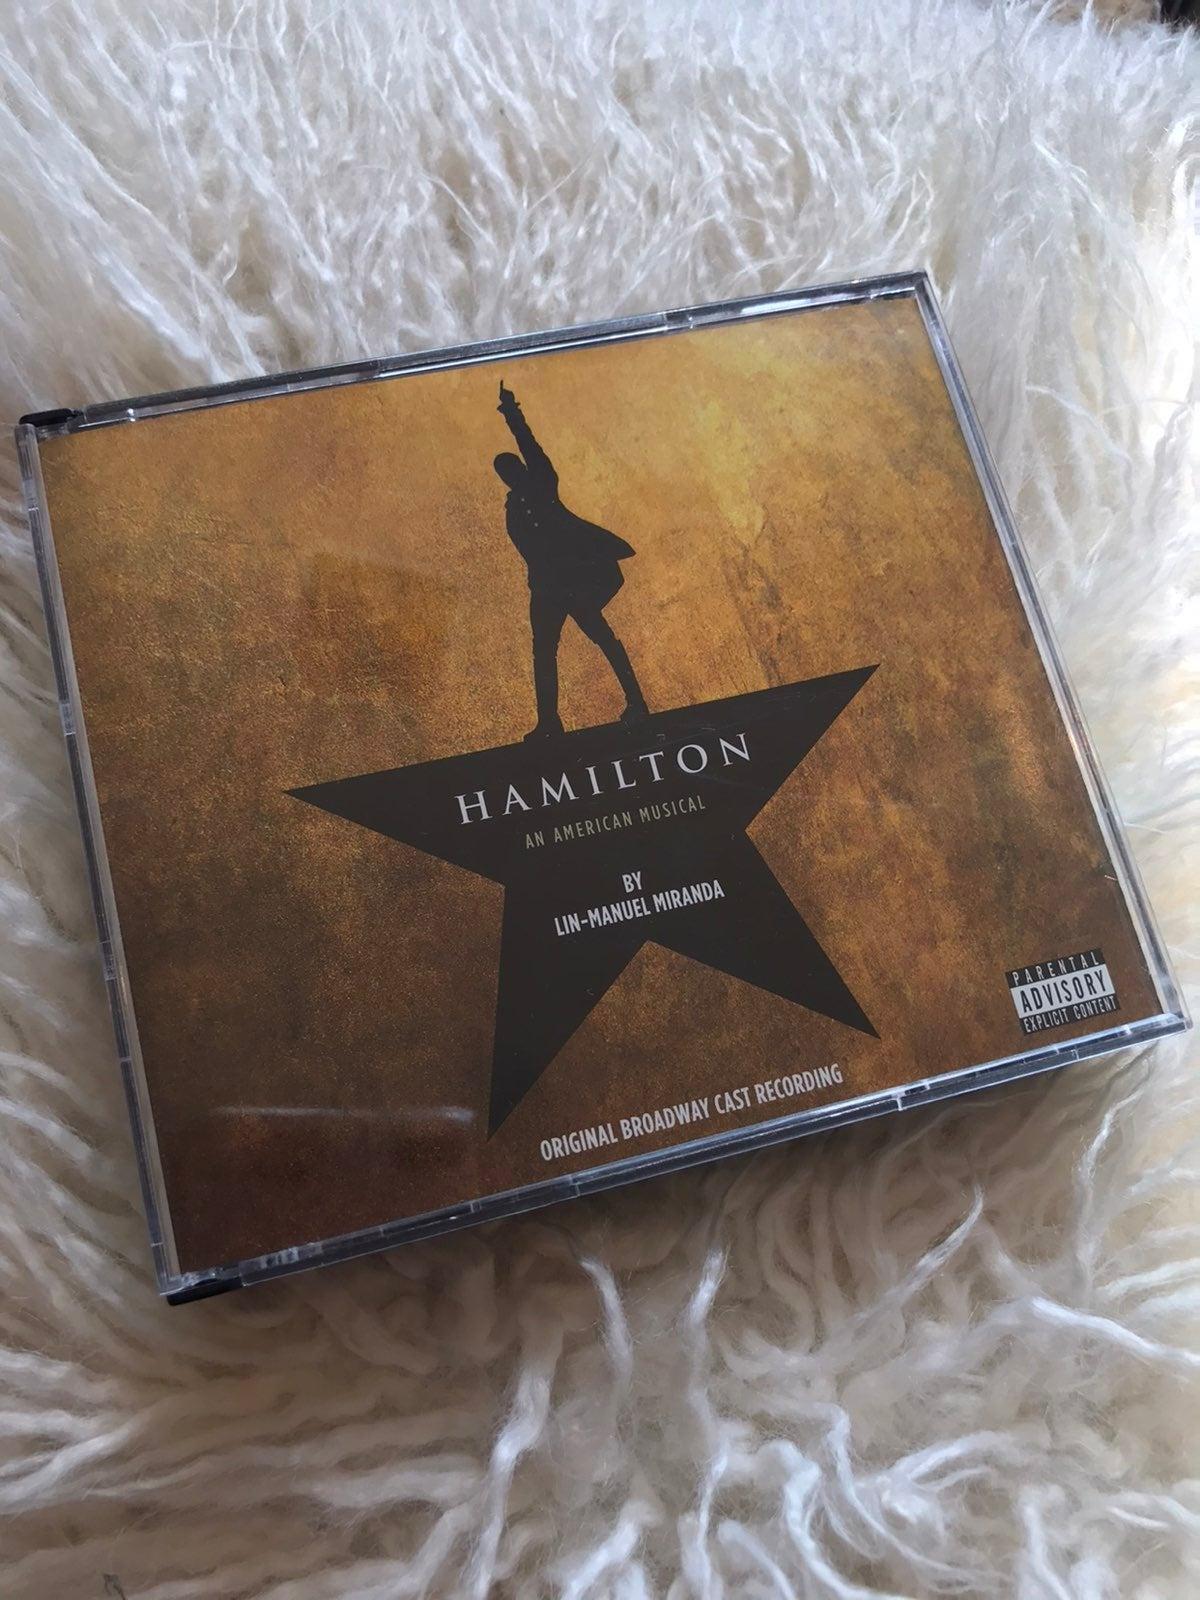 Hamilton Original Broadway CD